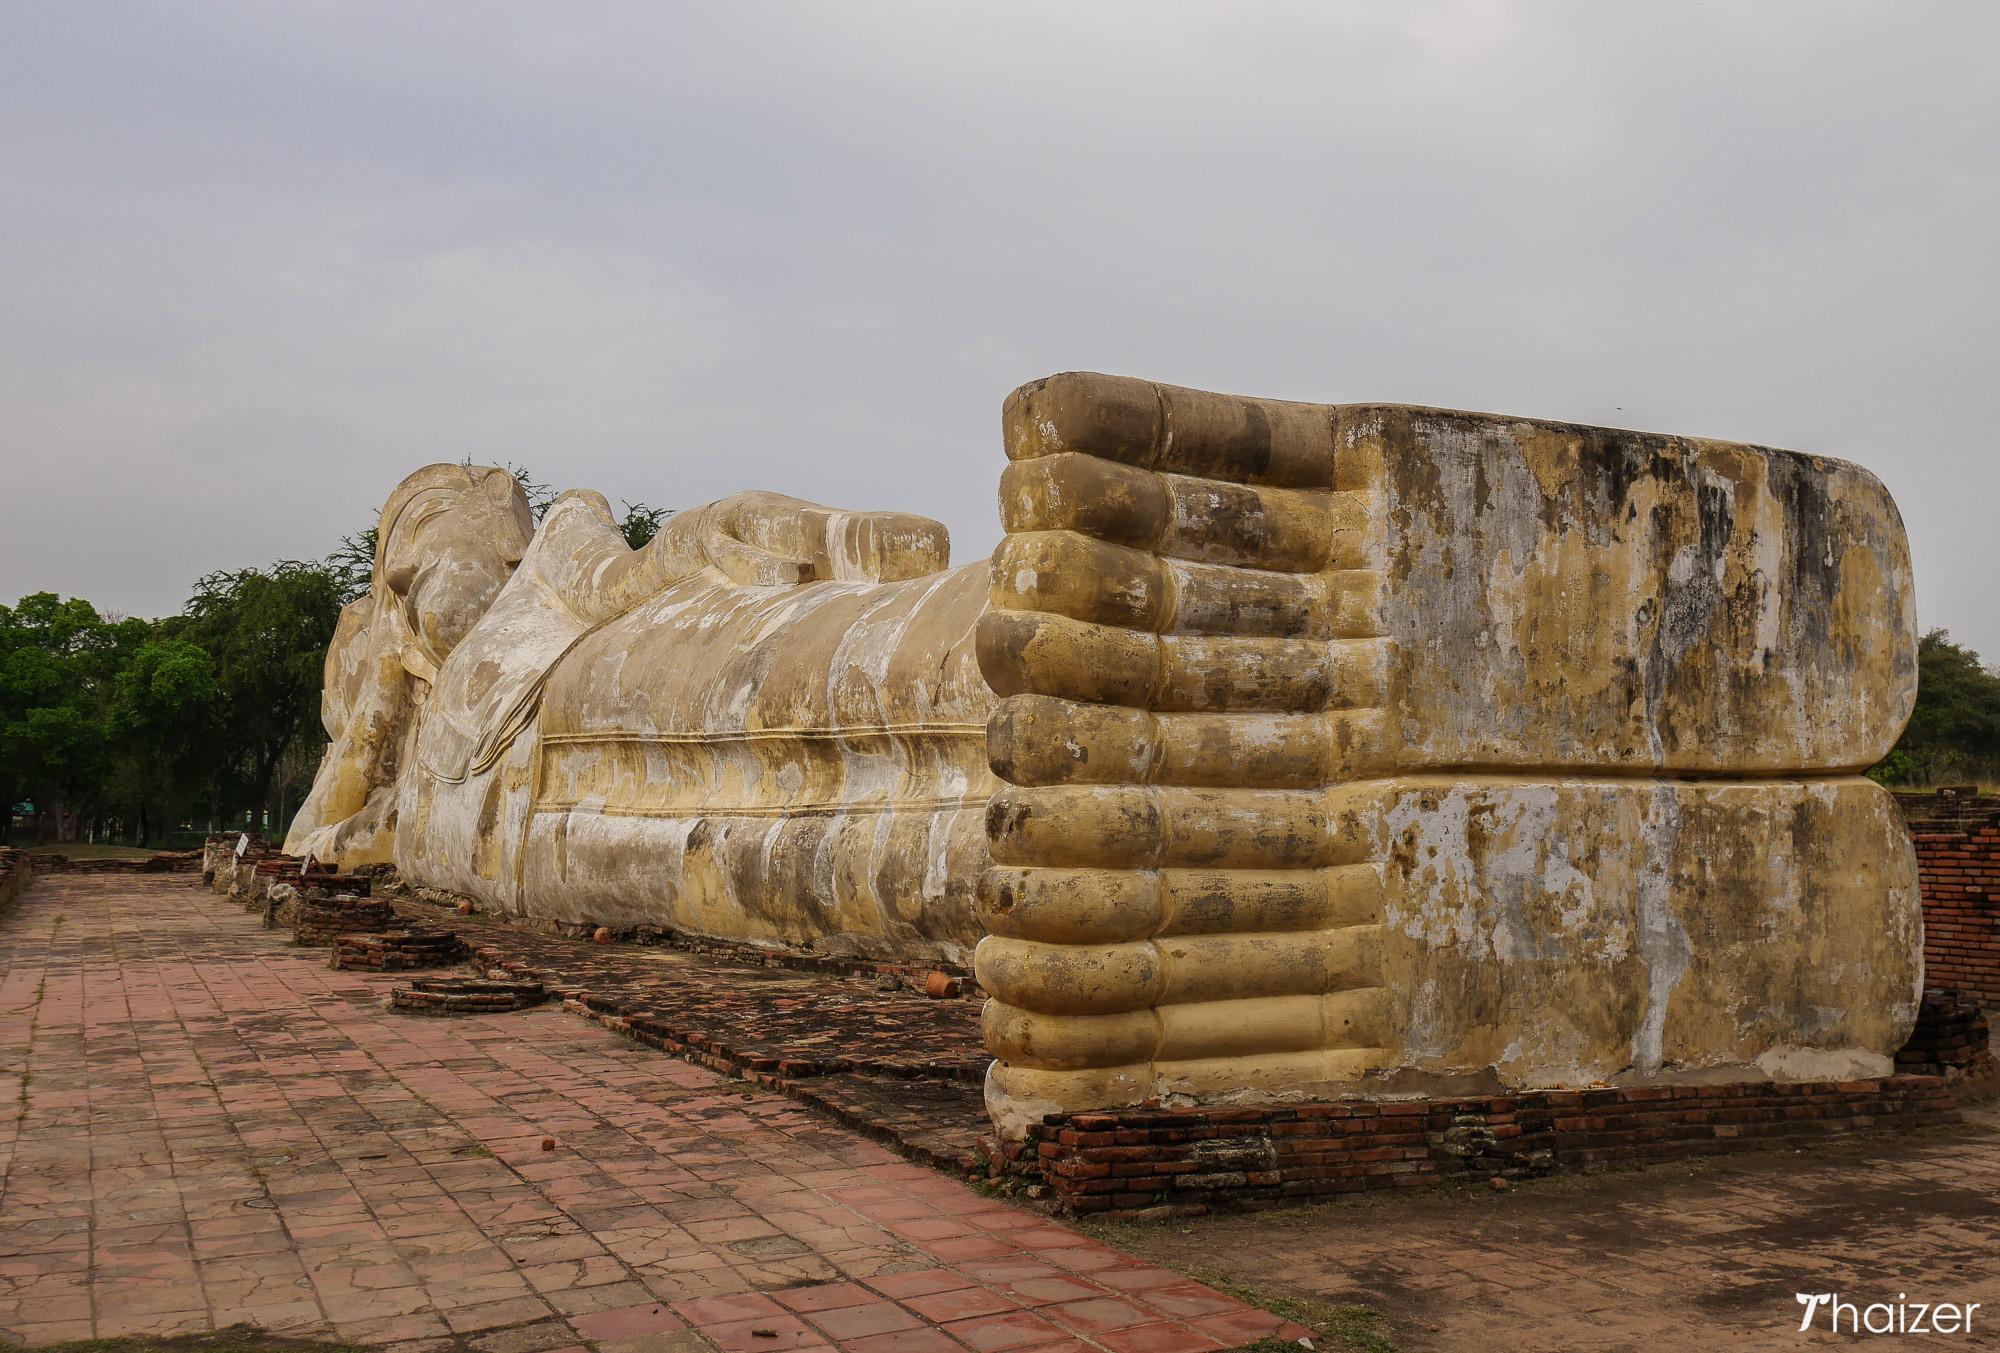 reclining-buddha-wat-lokaya-sutha-ayutthaya-2 Reclining Buddha, Wat Lokaya Sutha, Ayutthaya